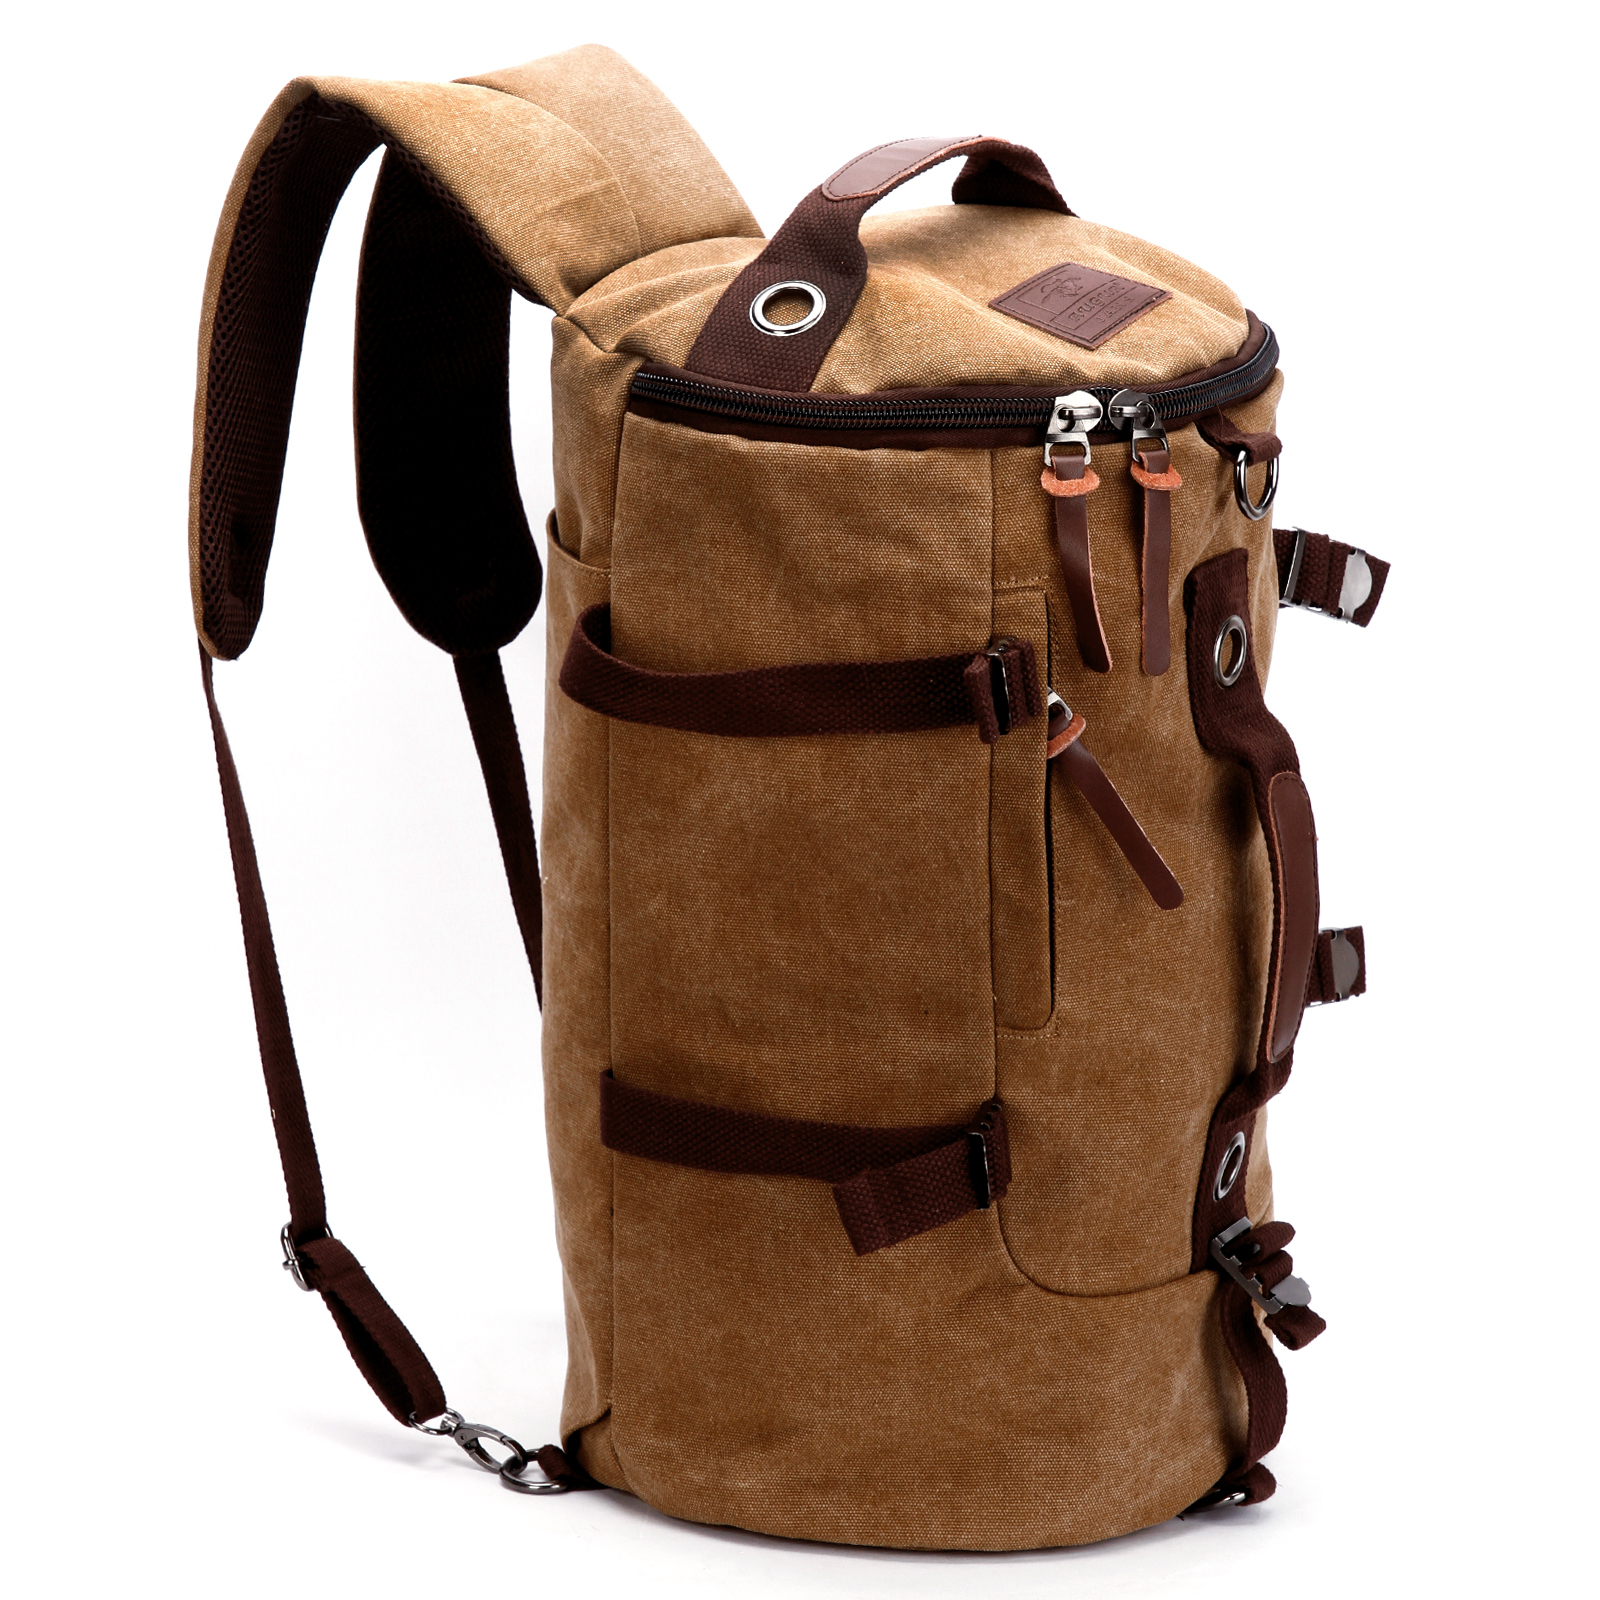 fe2d8d15684ba Vintage Canvas Leder Herren Rucksack Laptop Schulter Reise Wander Camping  Tasche